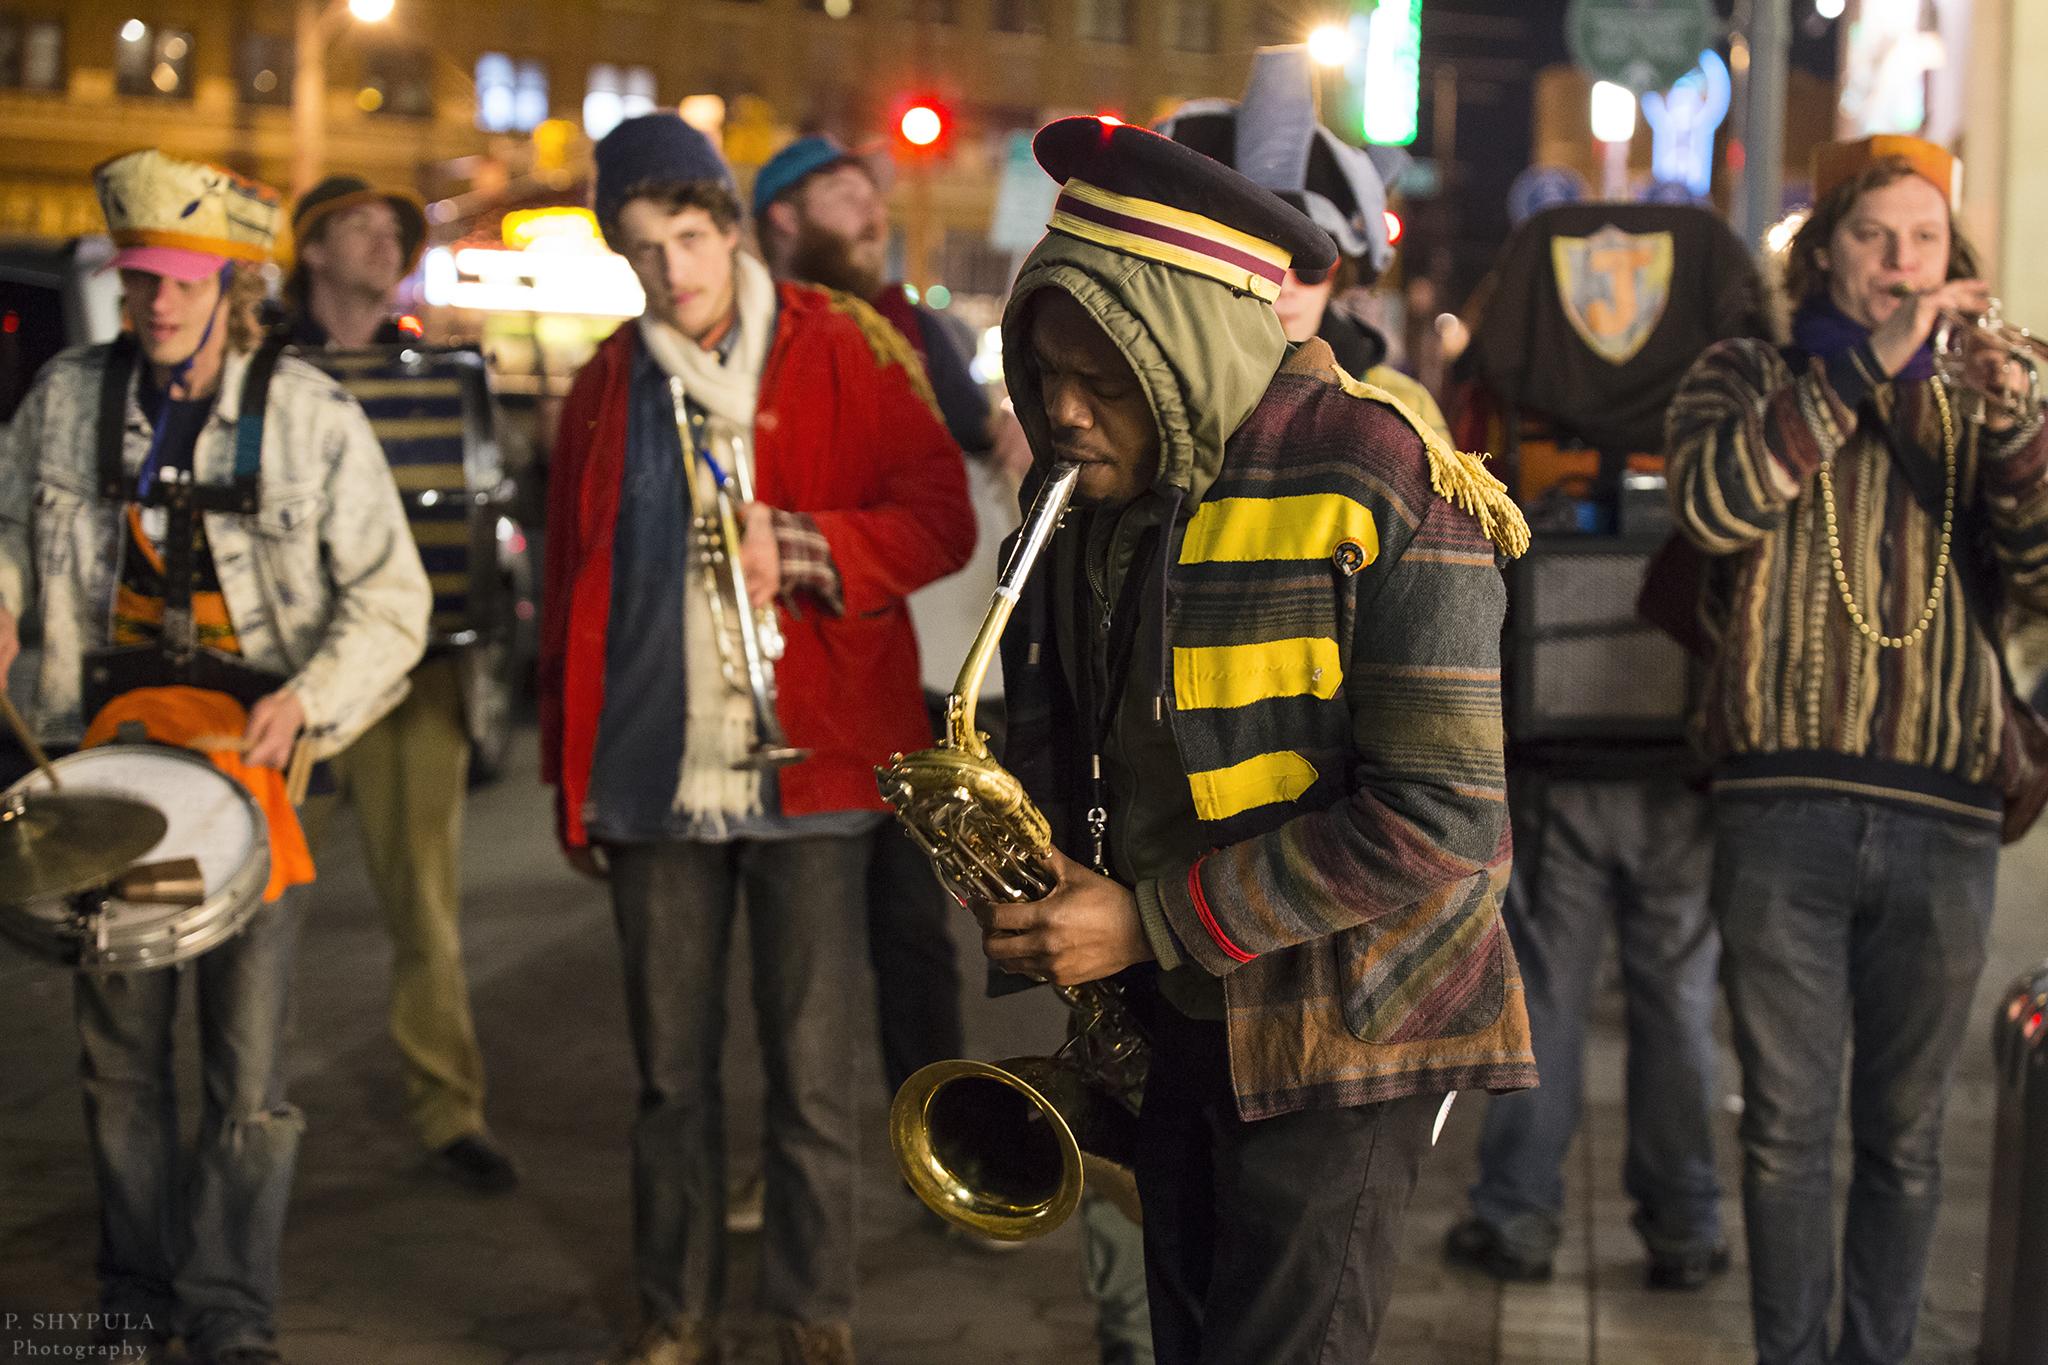 Jefferson Street Parade Band